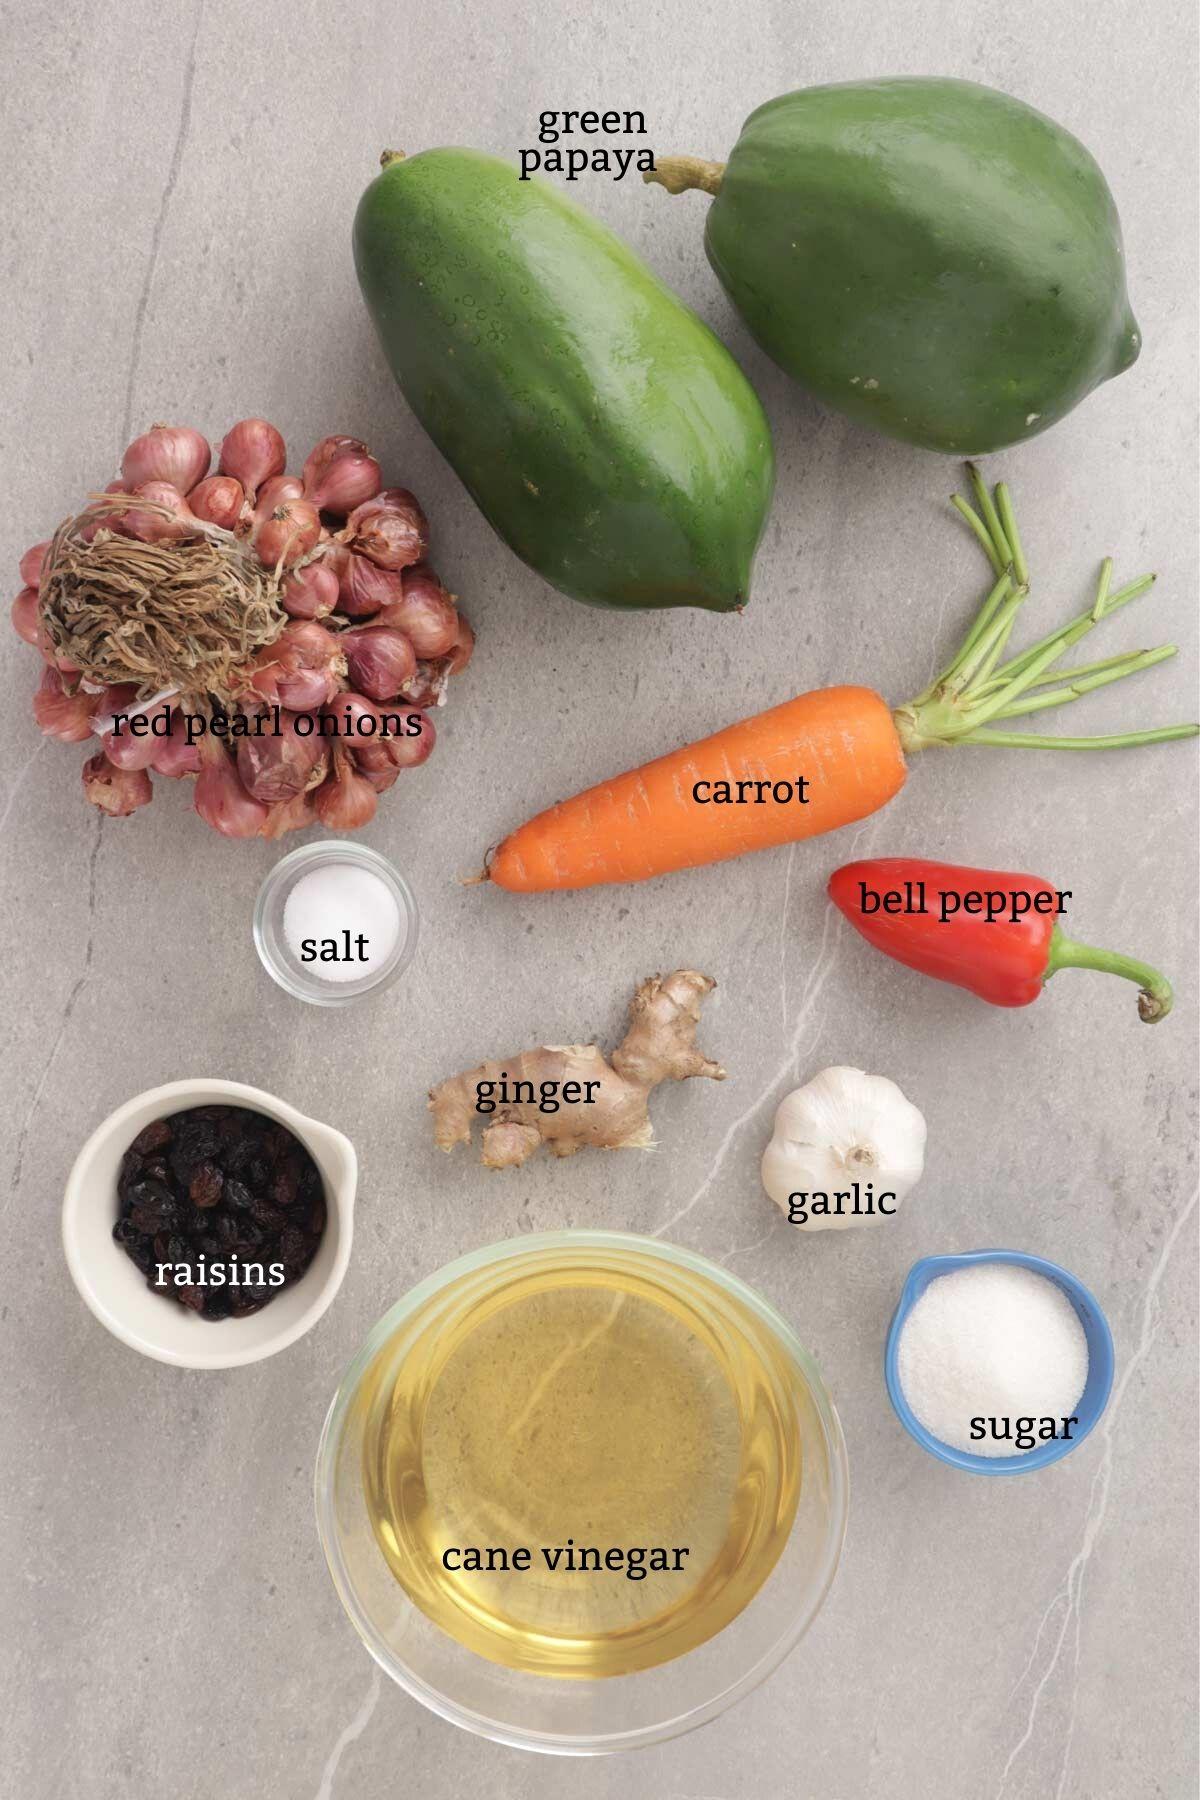 Ingredients for Atchara